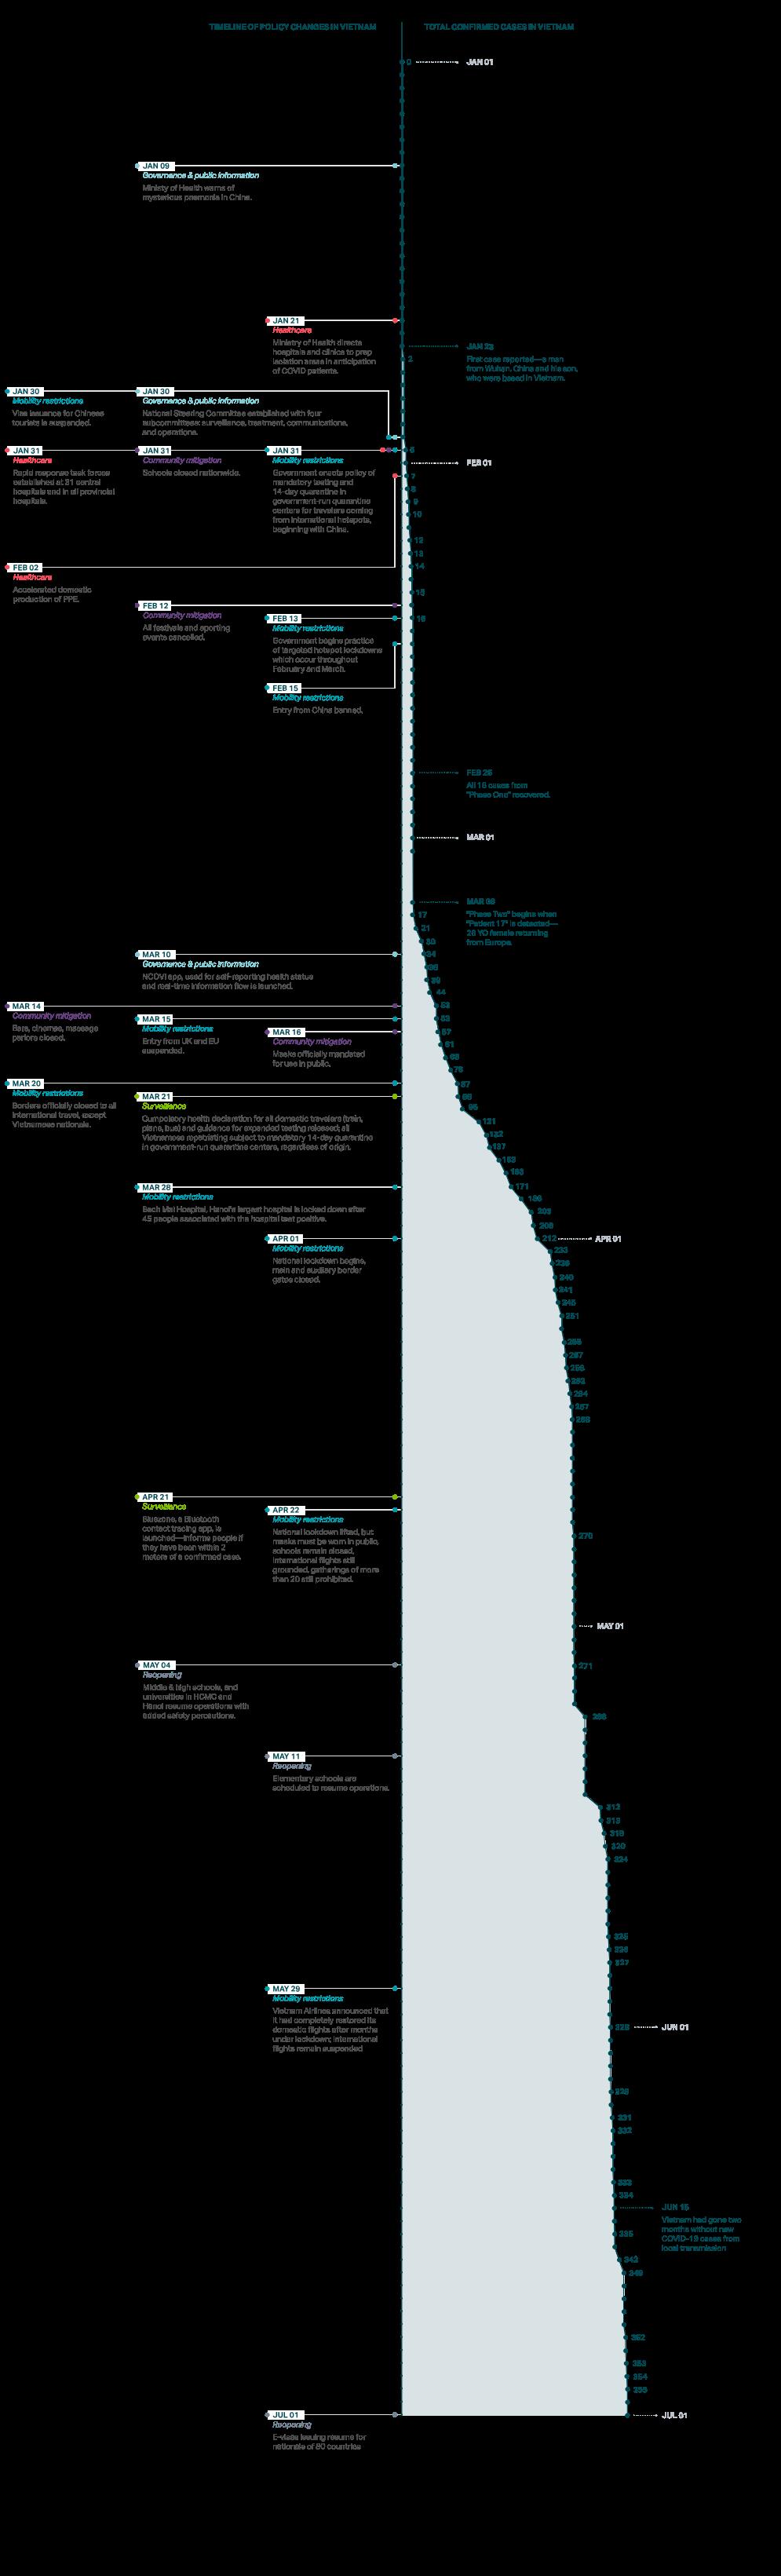 Vietnam covid timeline